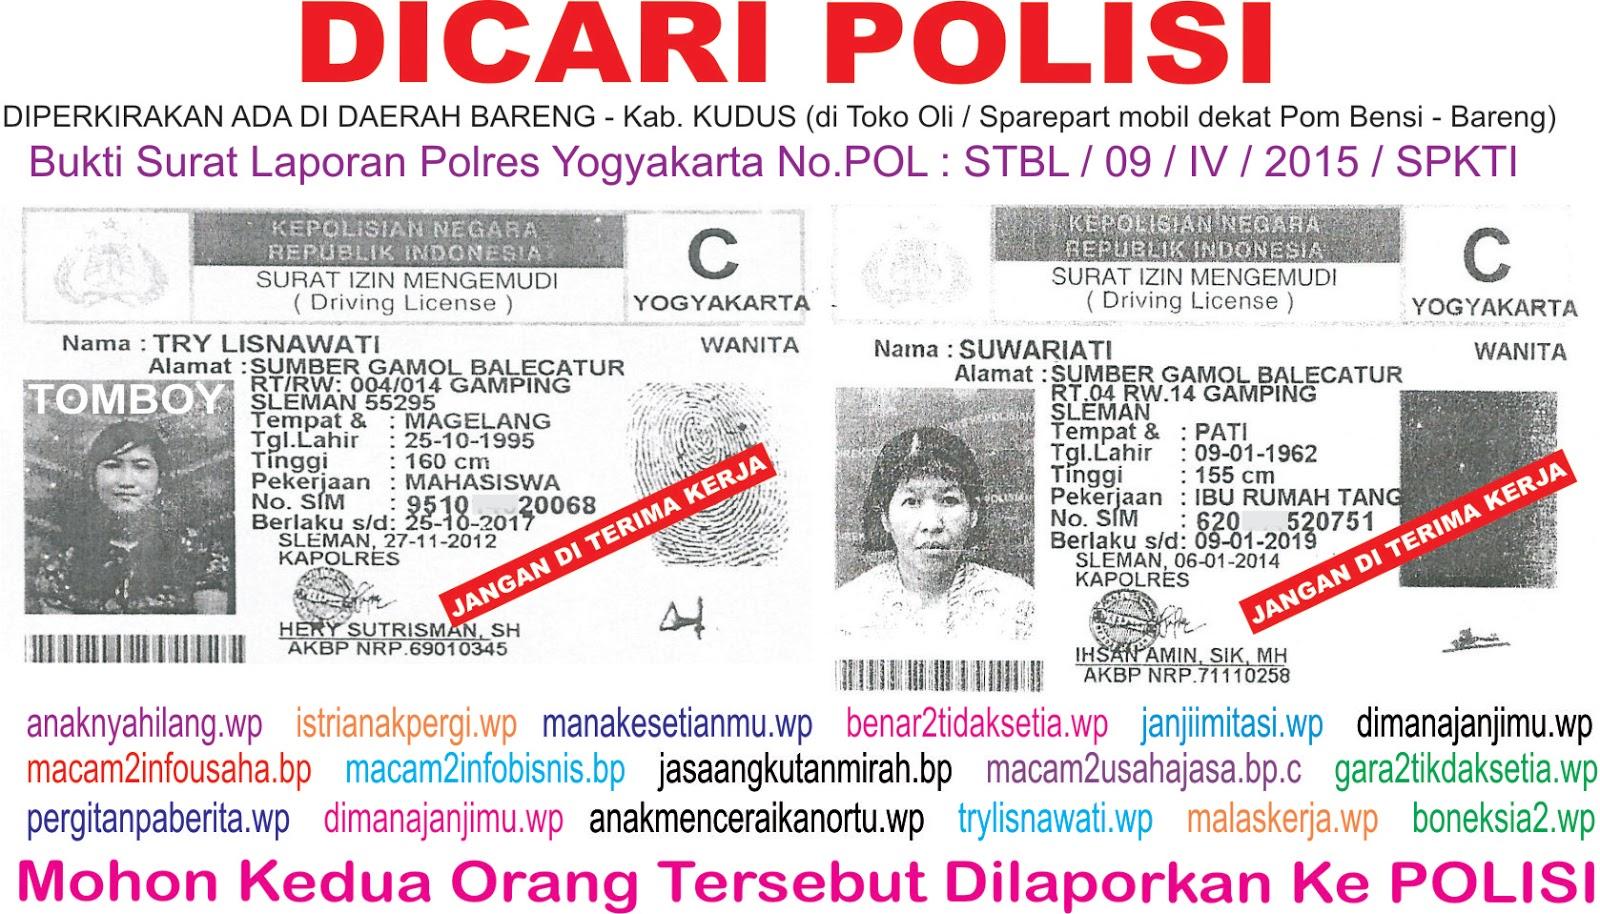 Freeport jakarta, Timika, Surabaya, Jakarta, Yogya